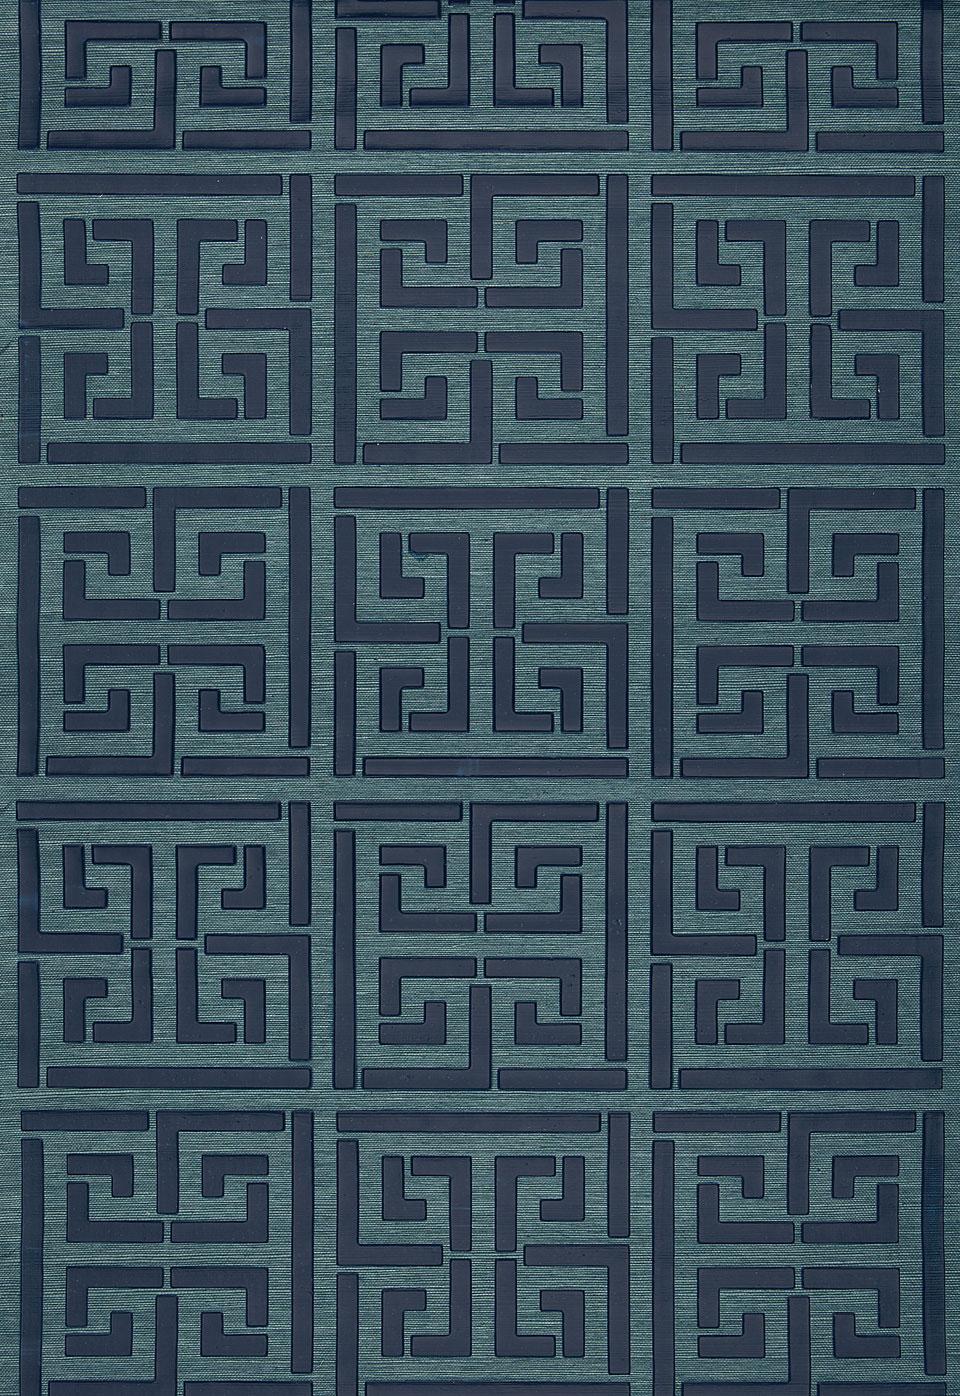 Wallpaper Trends 2015 Grasscloths Sisals Loretta J Willis 960x1396